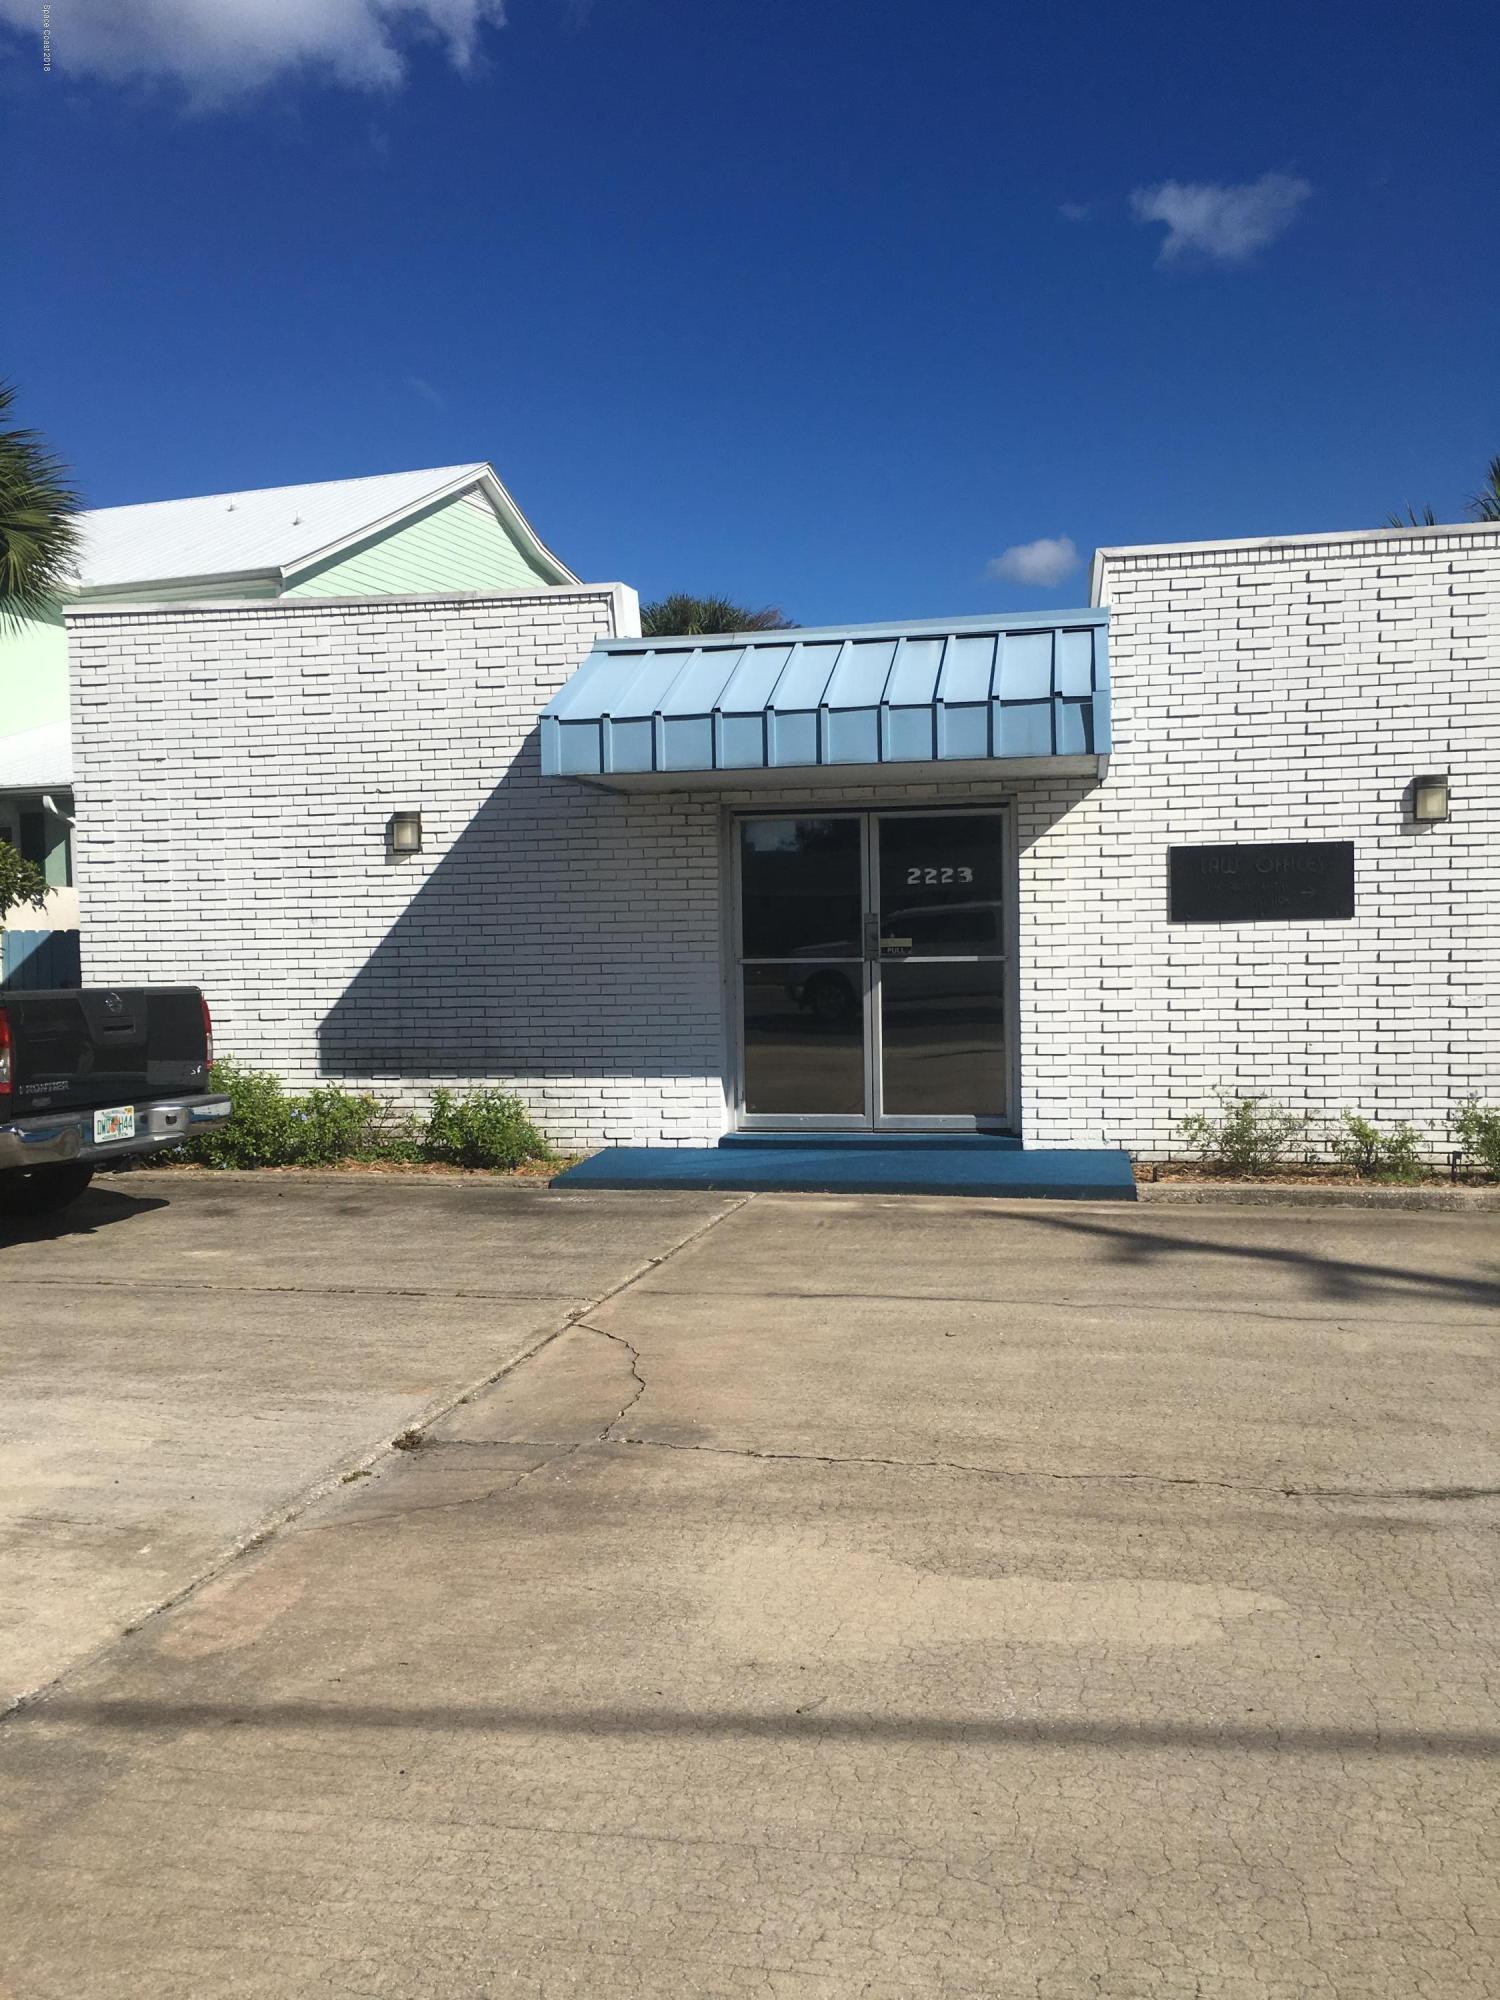 Commercial for Sale at 2223 S Washington Avenue 2223 S Washington Avenue Titusville, Florida 32780 United States